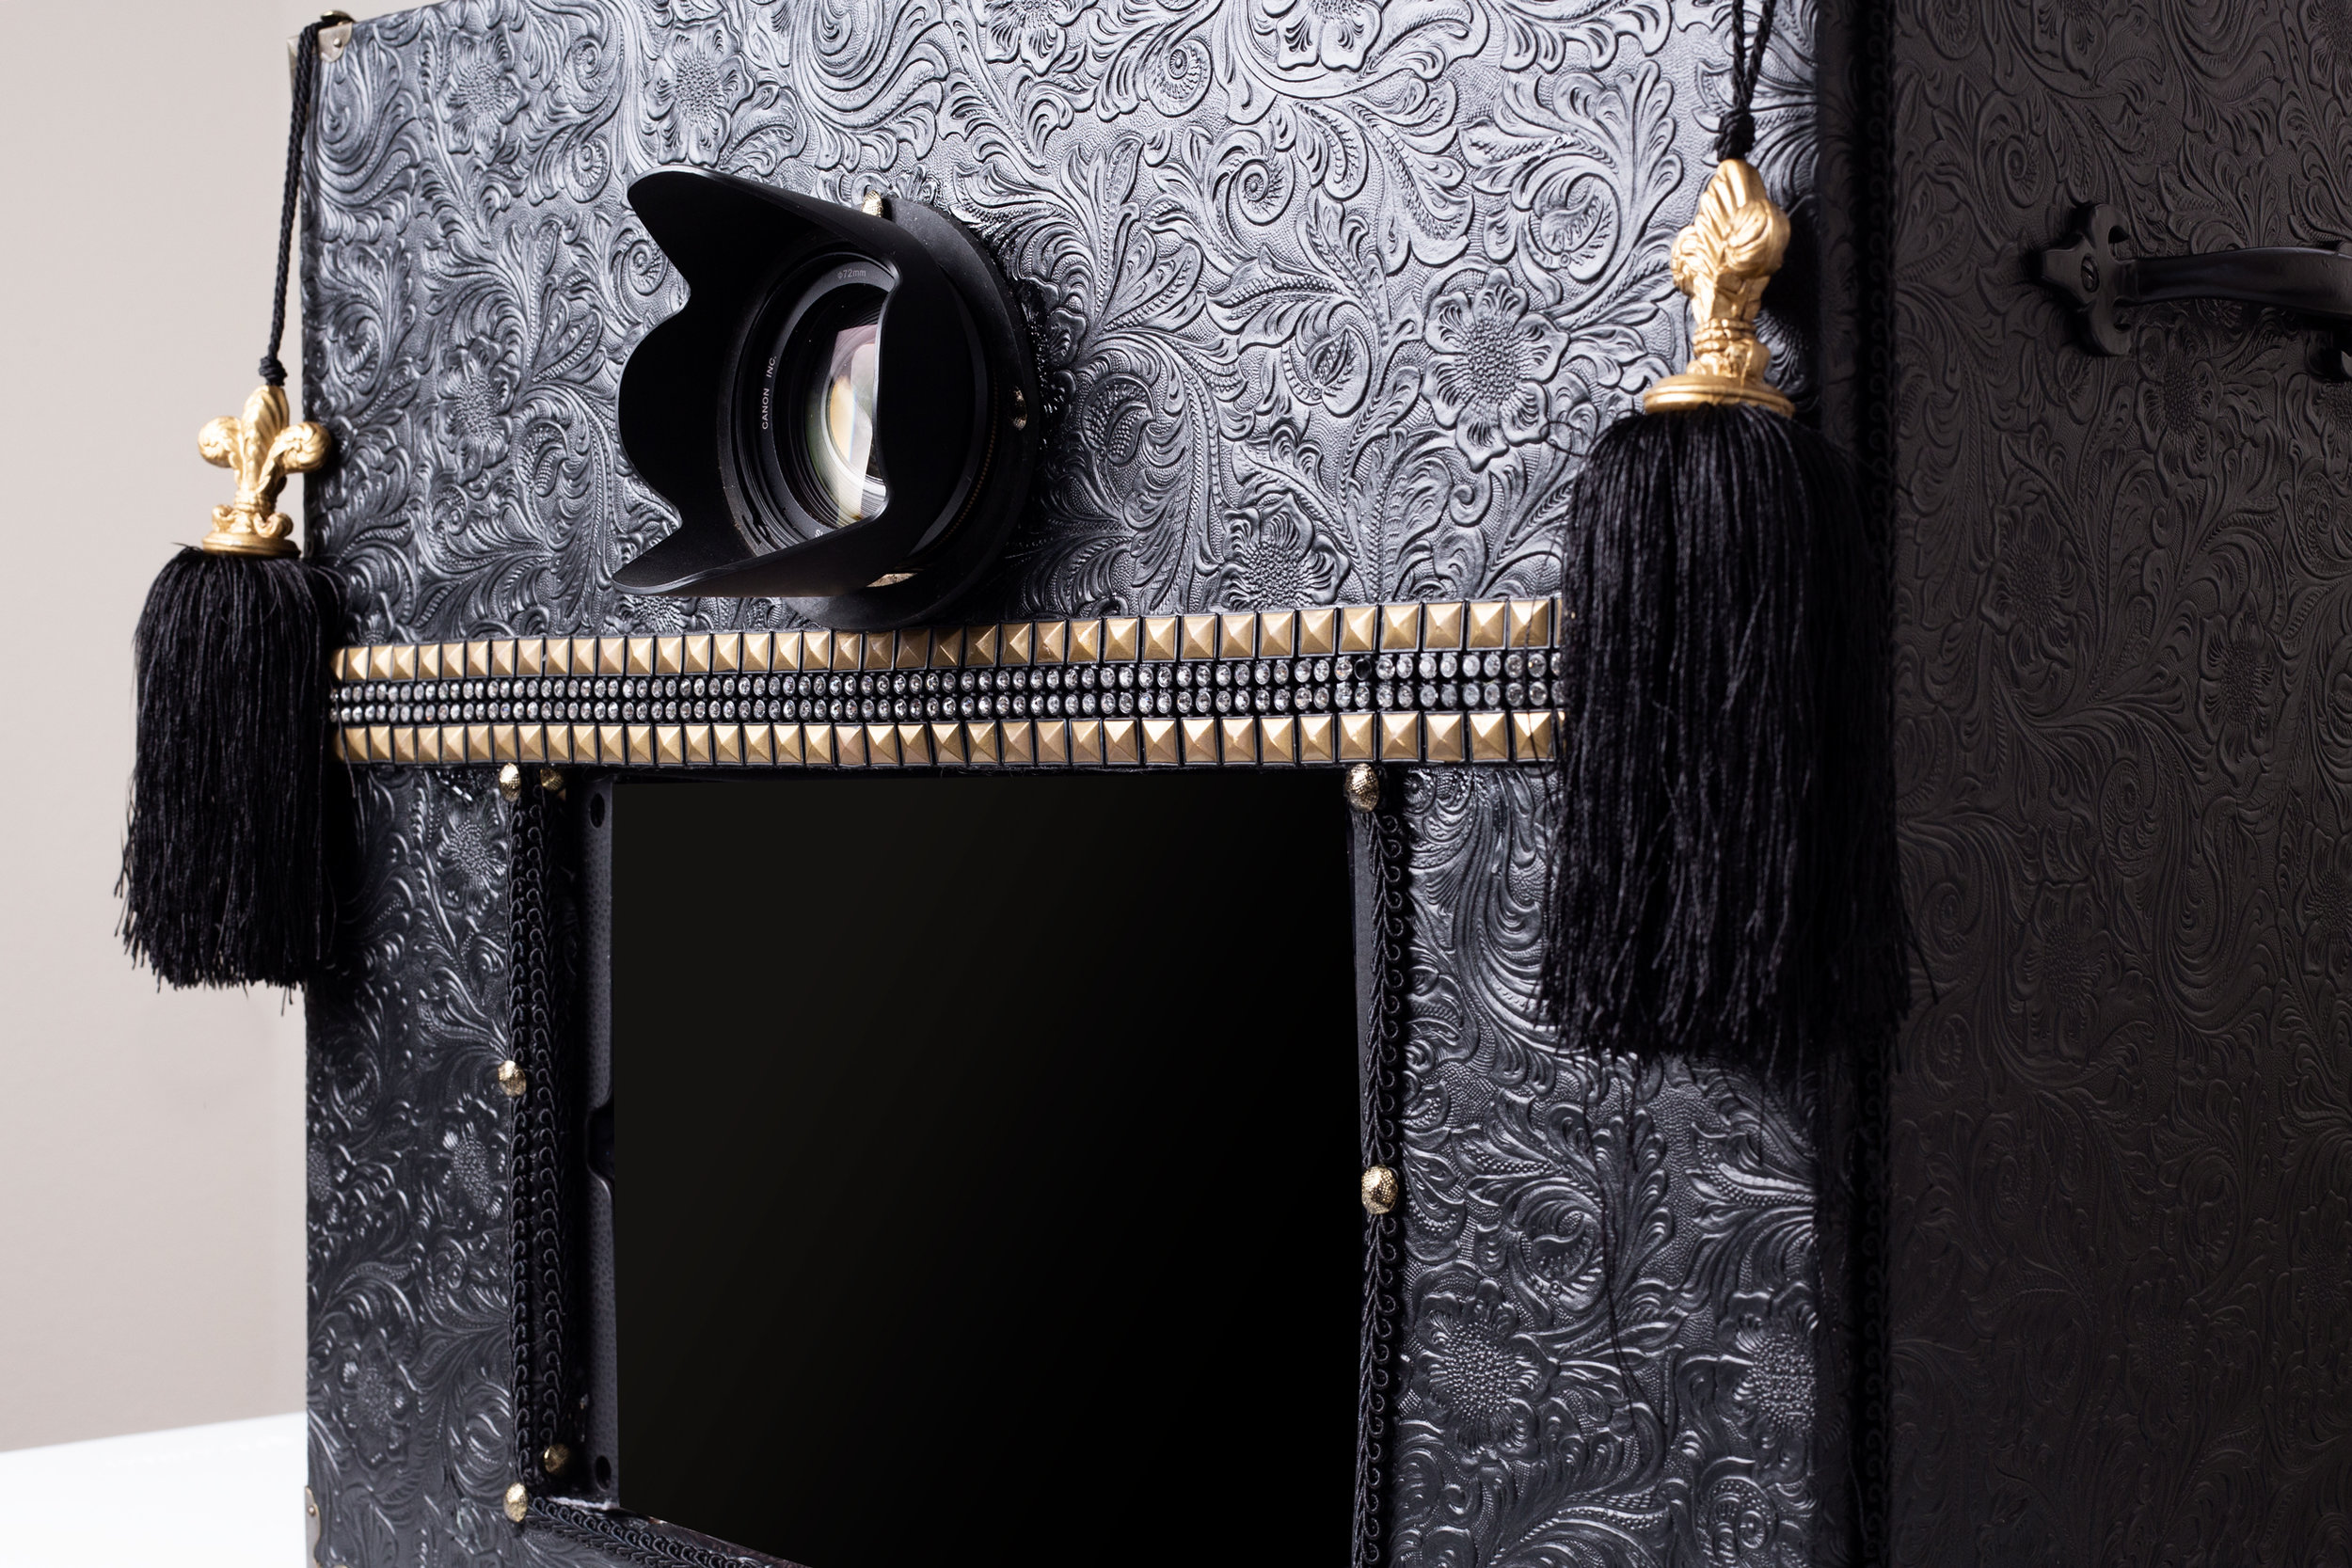 booth-chamber-photo-booth-orlando-florida-photography-3.jpg